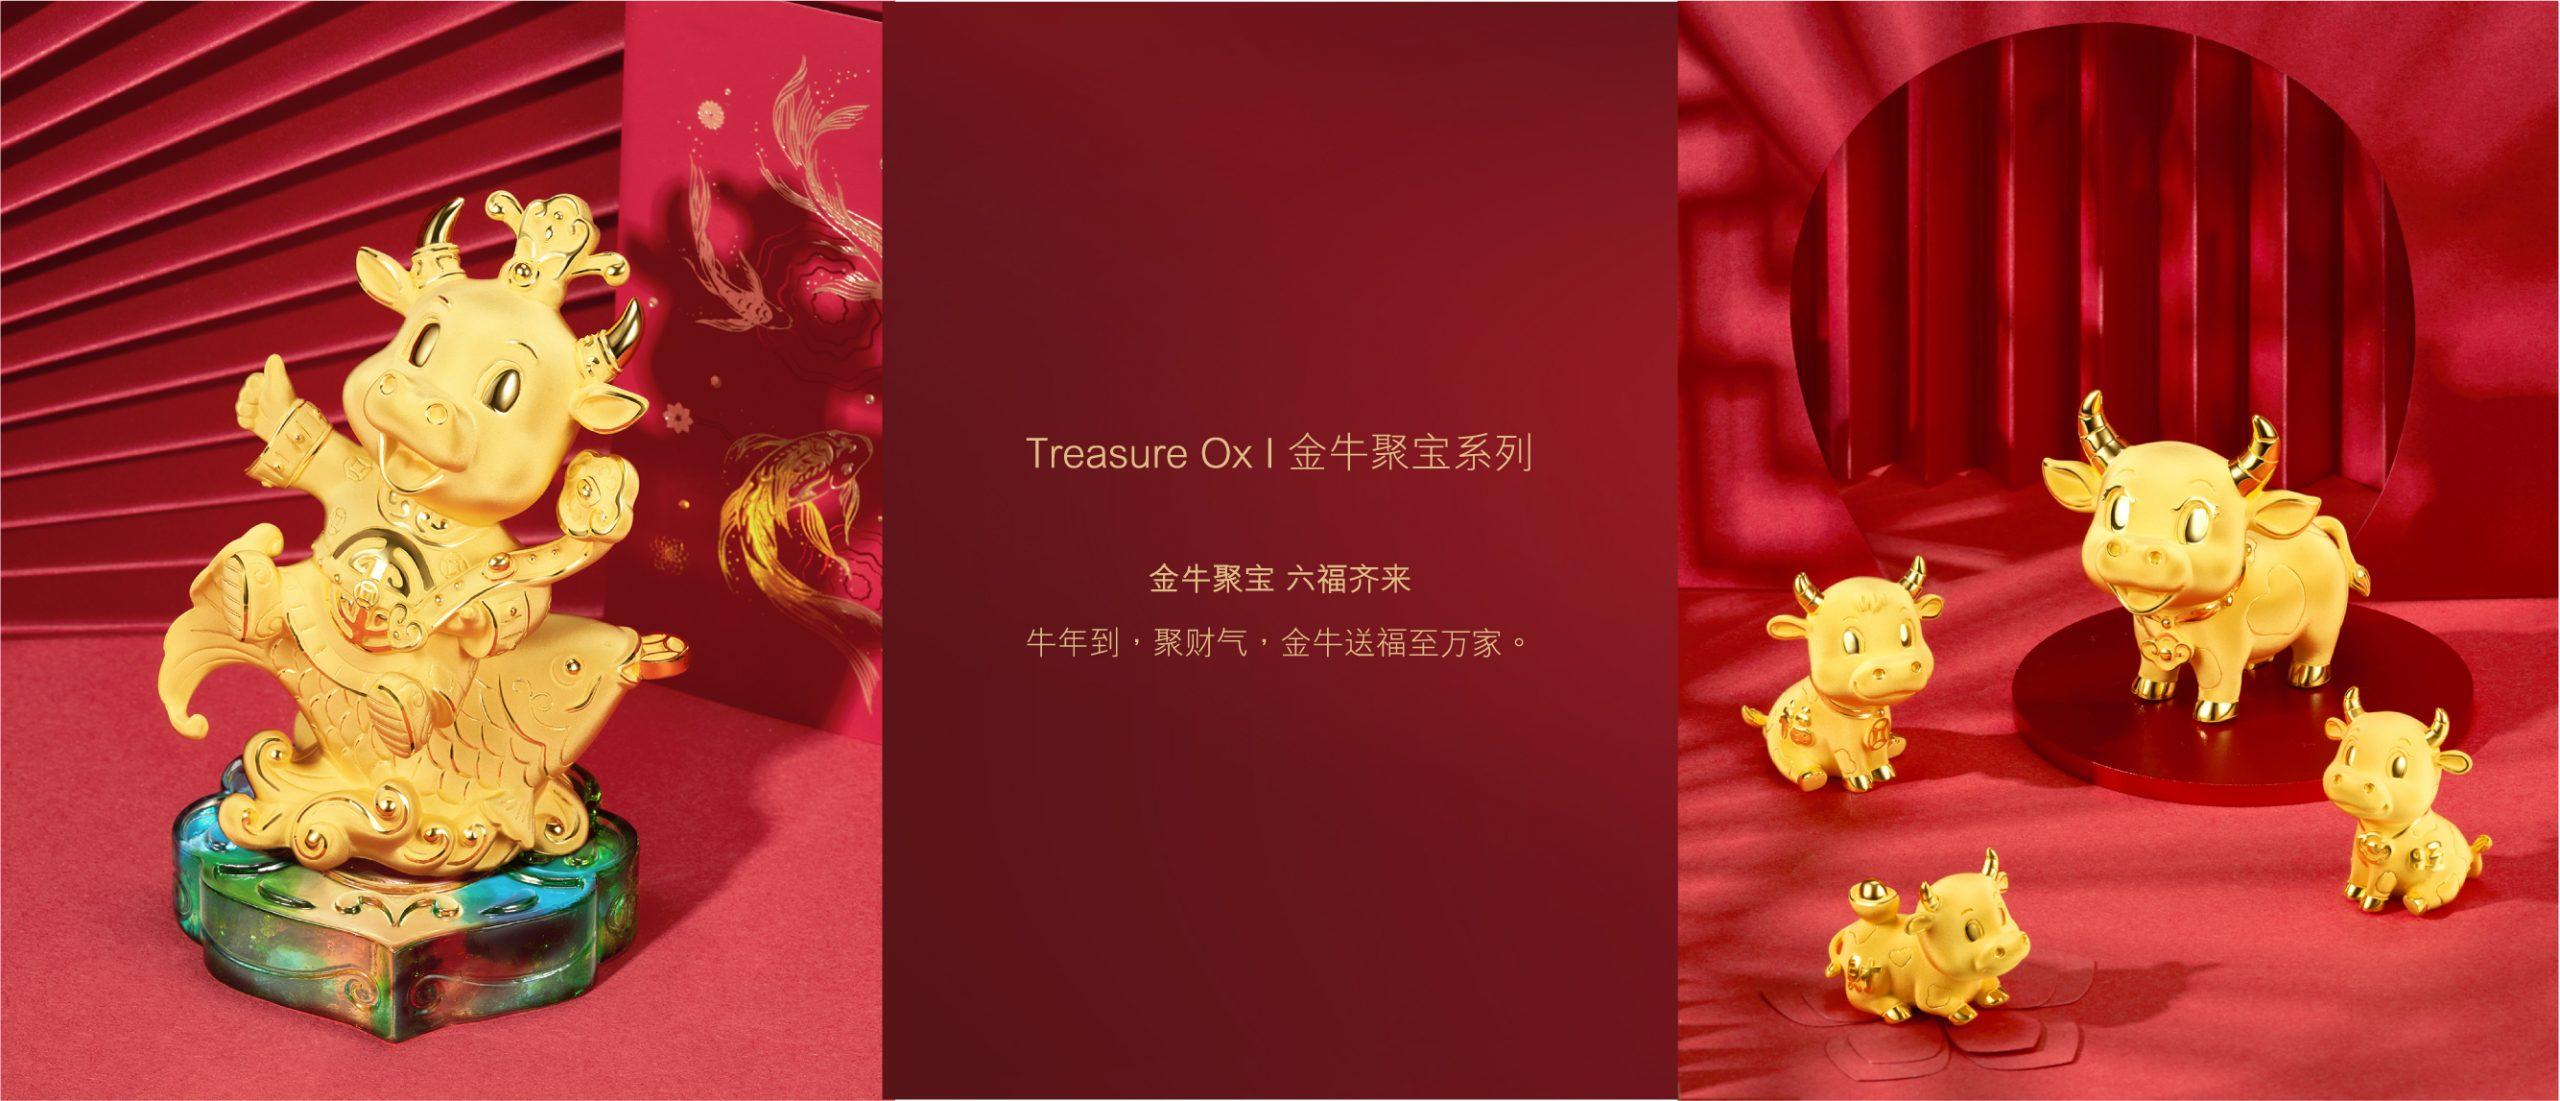 Treasure Ox |「金牛聚宝」系列